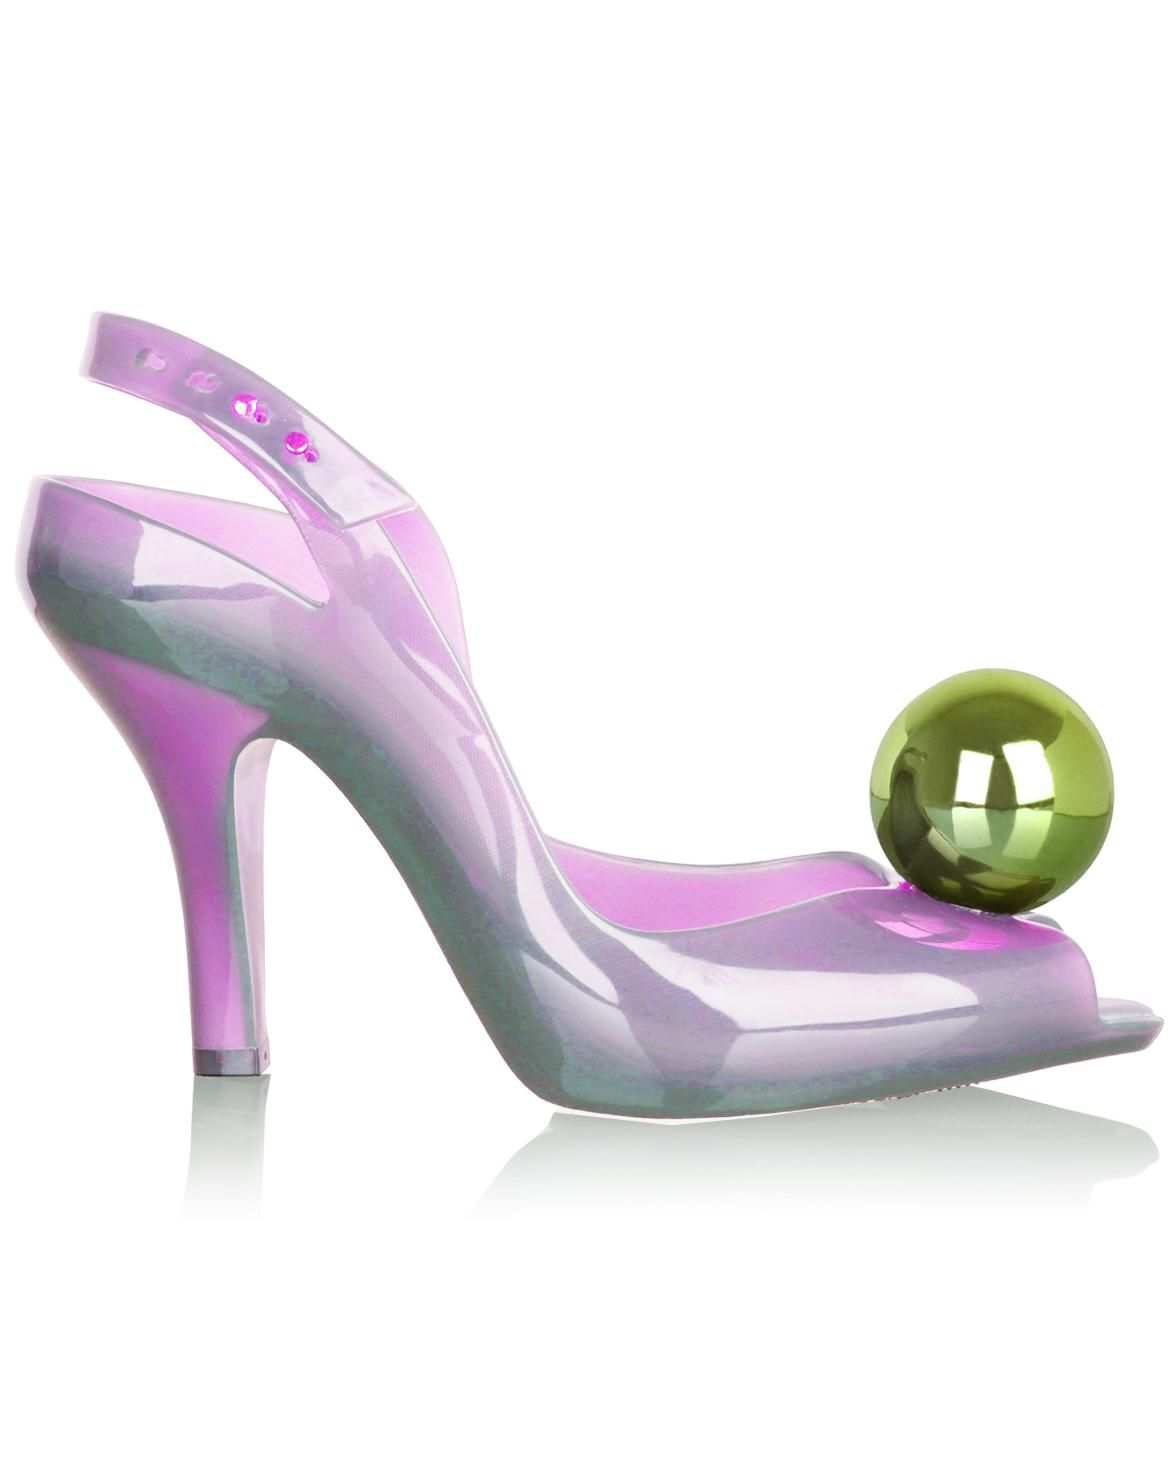 Vivienne Westwood Melissa Lady Dragon Ball Pink replica,fake Vivienne Westwood Shoes